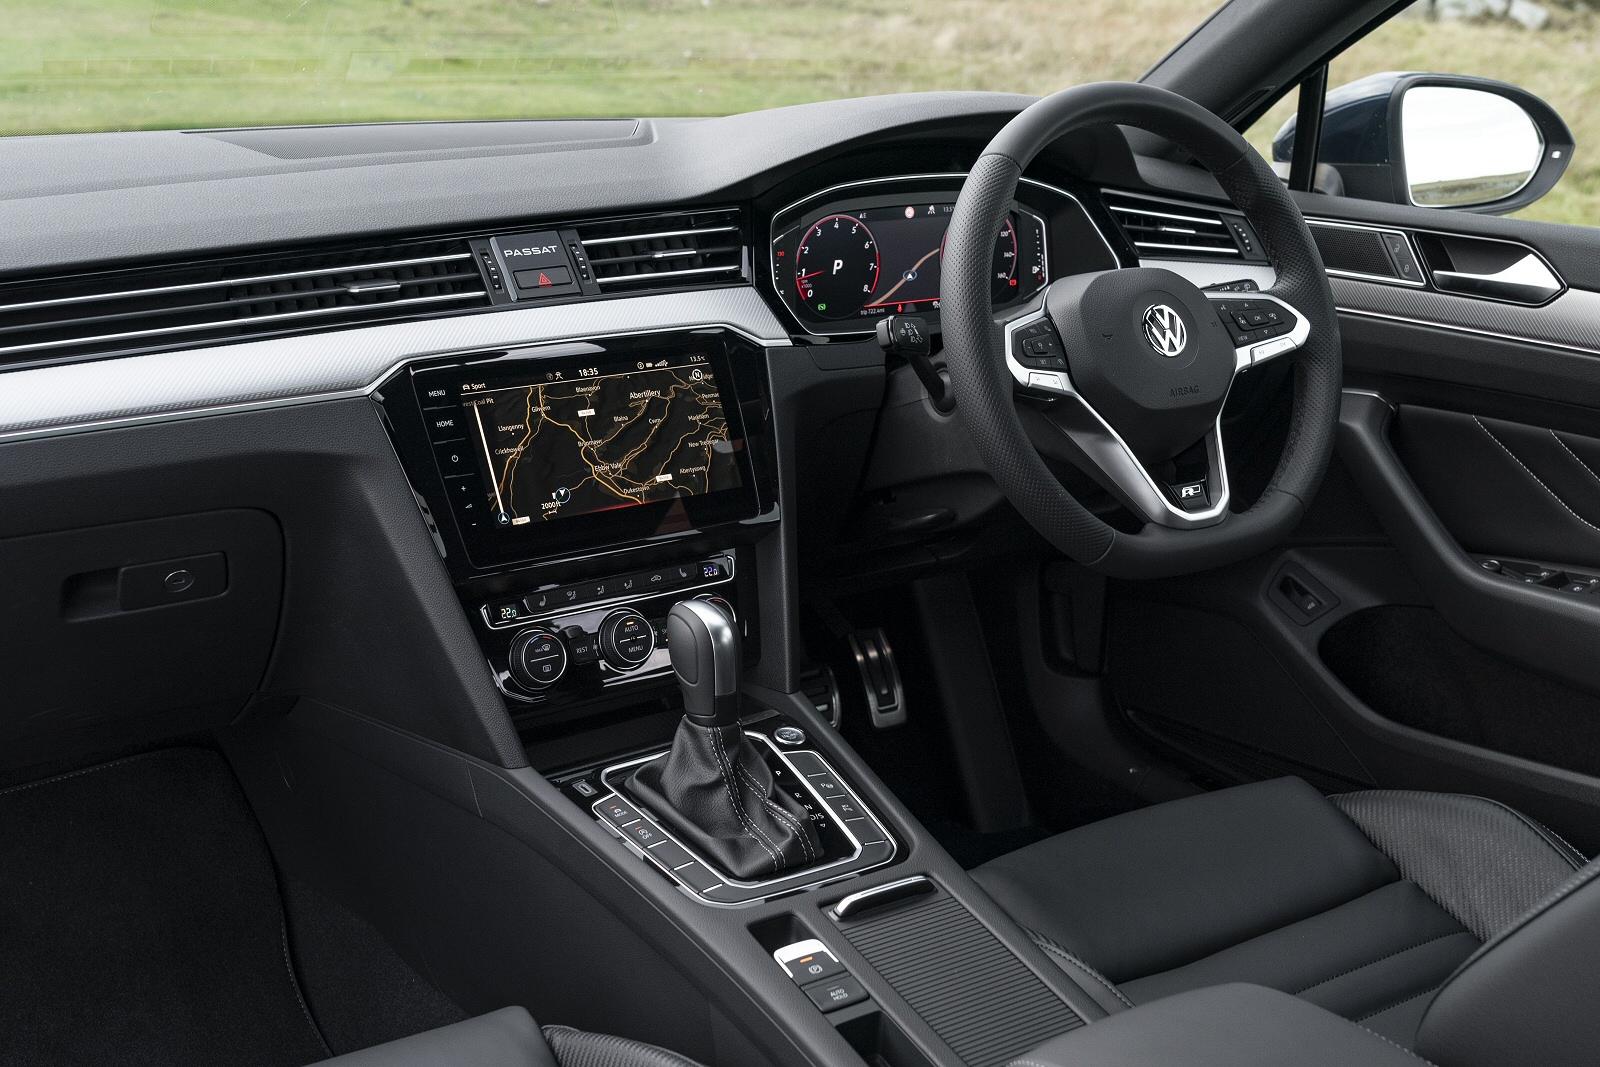 Volkswagen PASSAT 2.0 TDI SCR 190 R-Line 5dr DSG